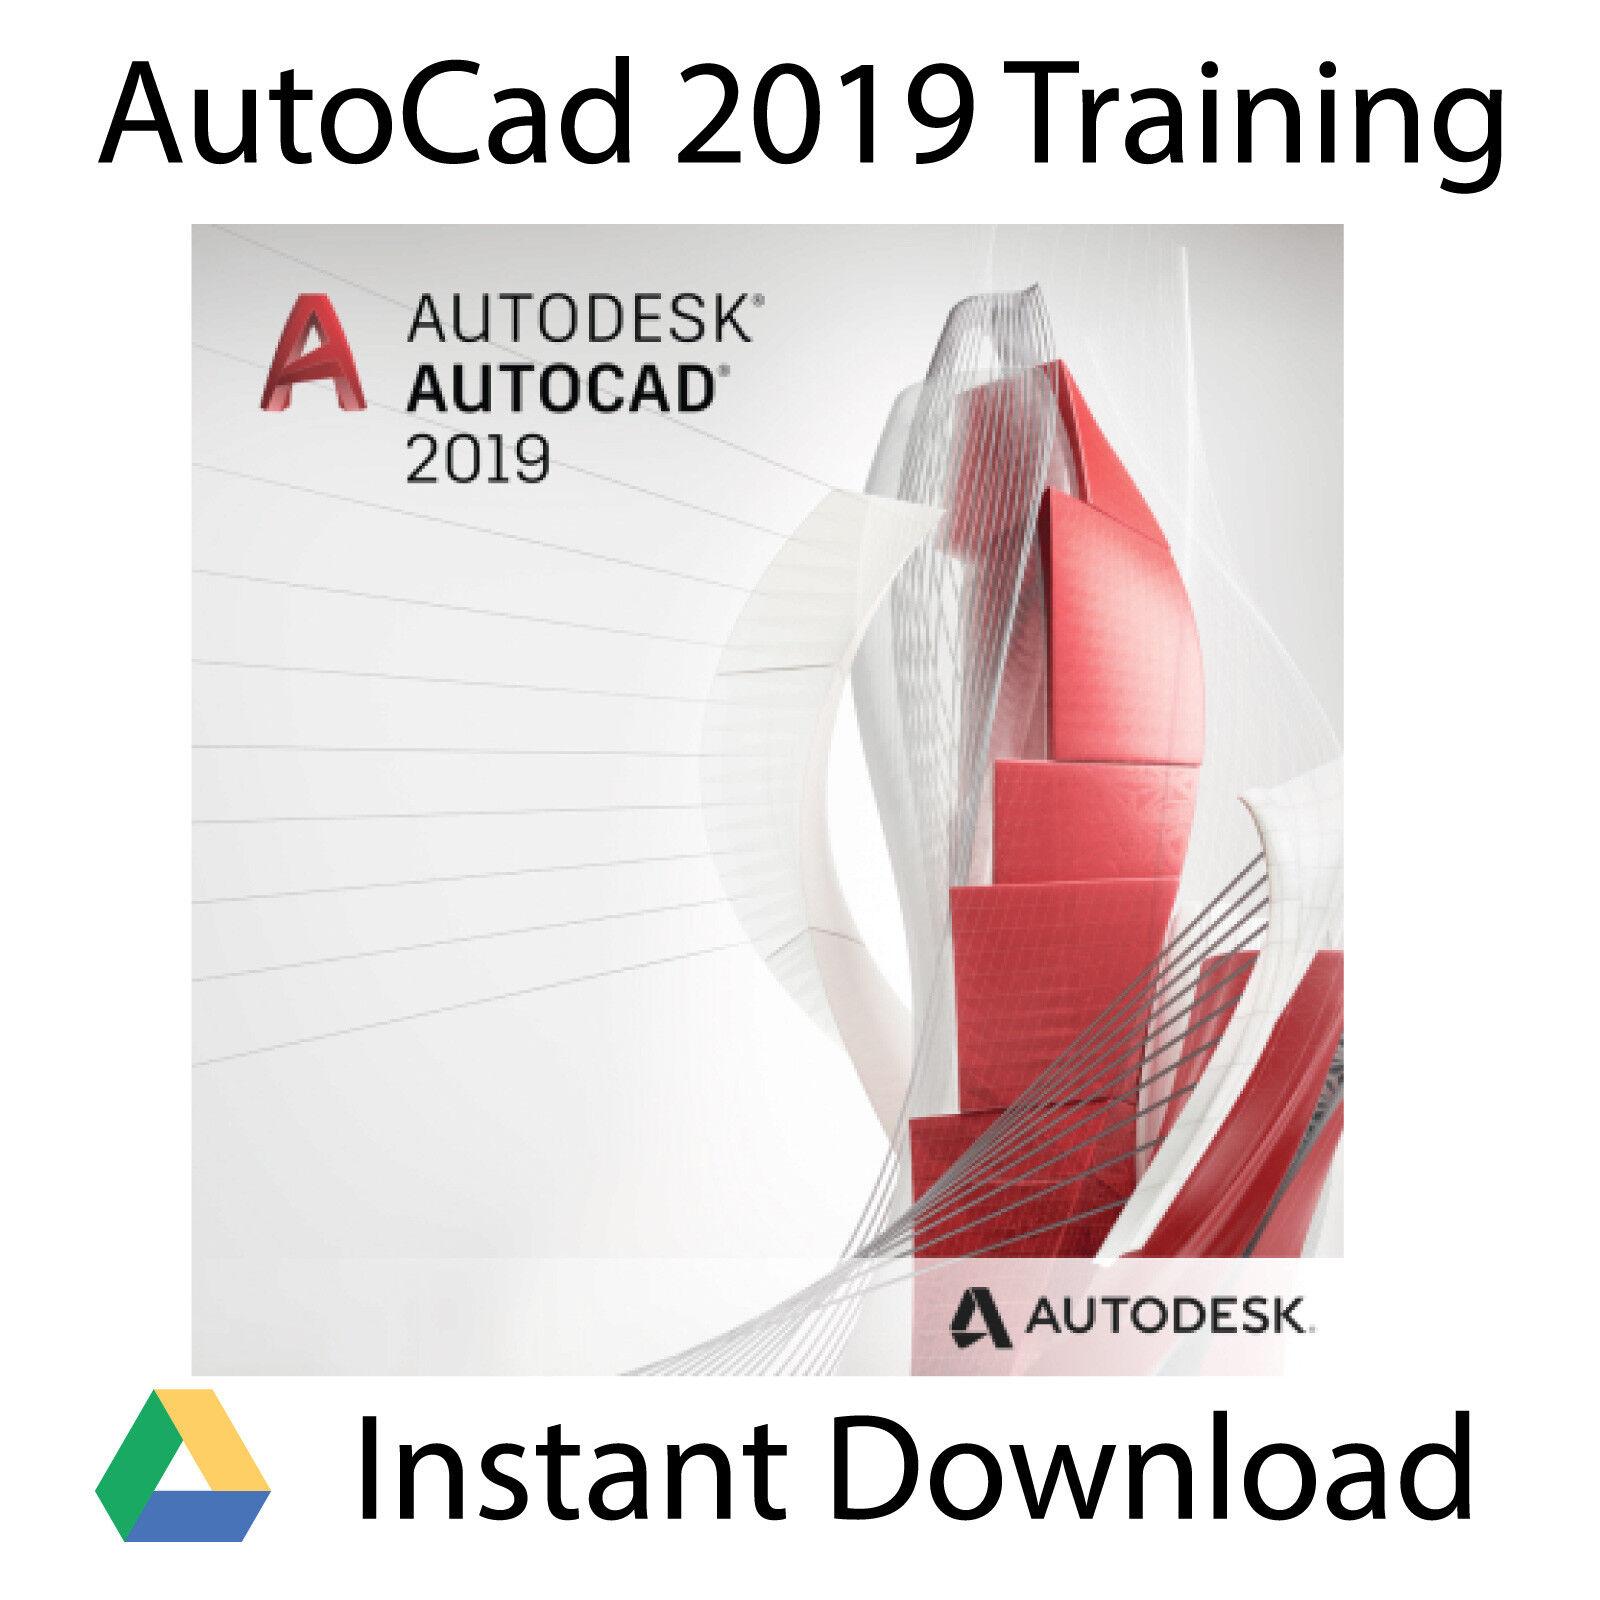 Autodesk AutoCAD 2019 Professional Video Training Tutorial - Instant Download